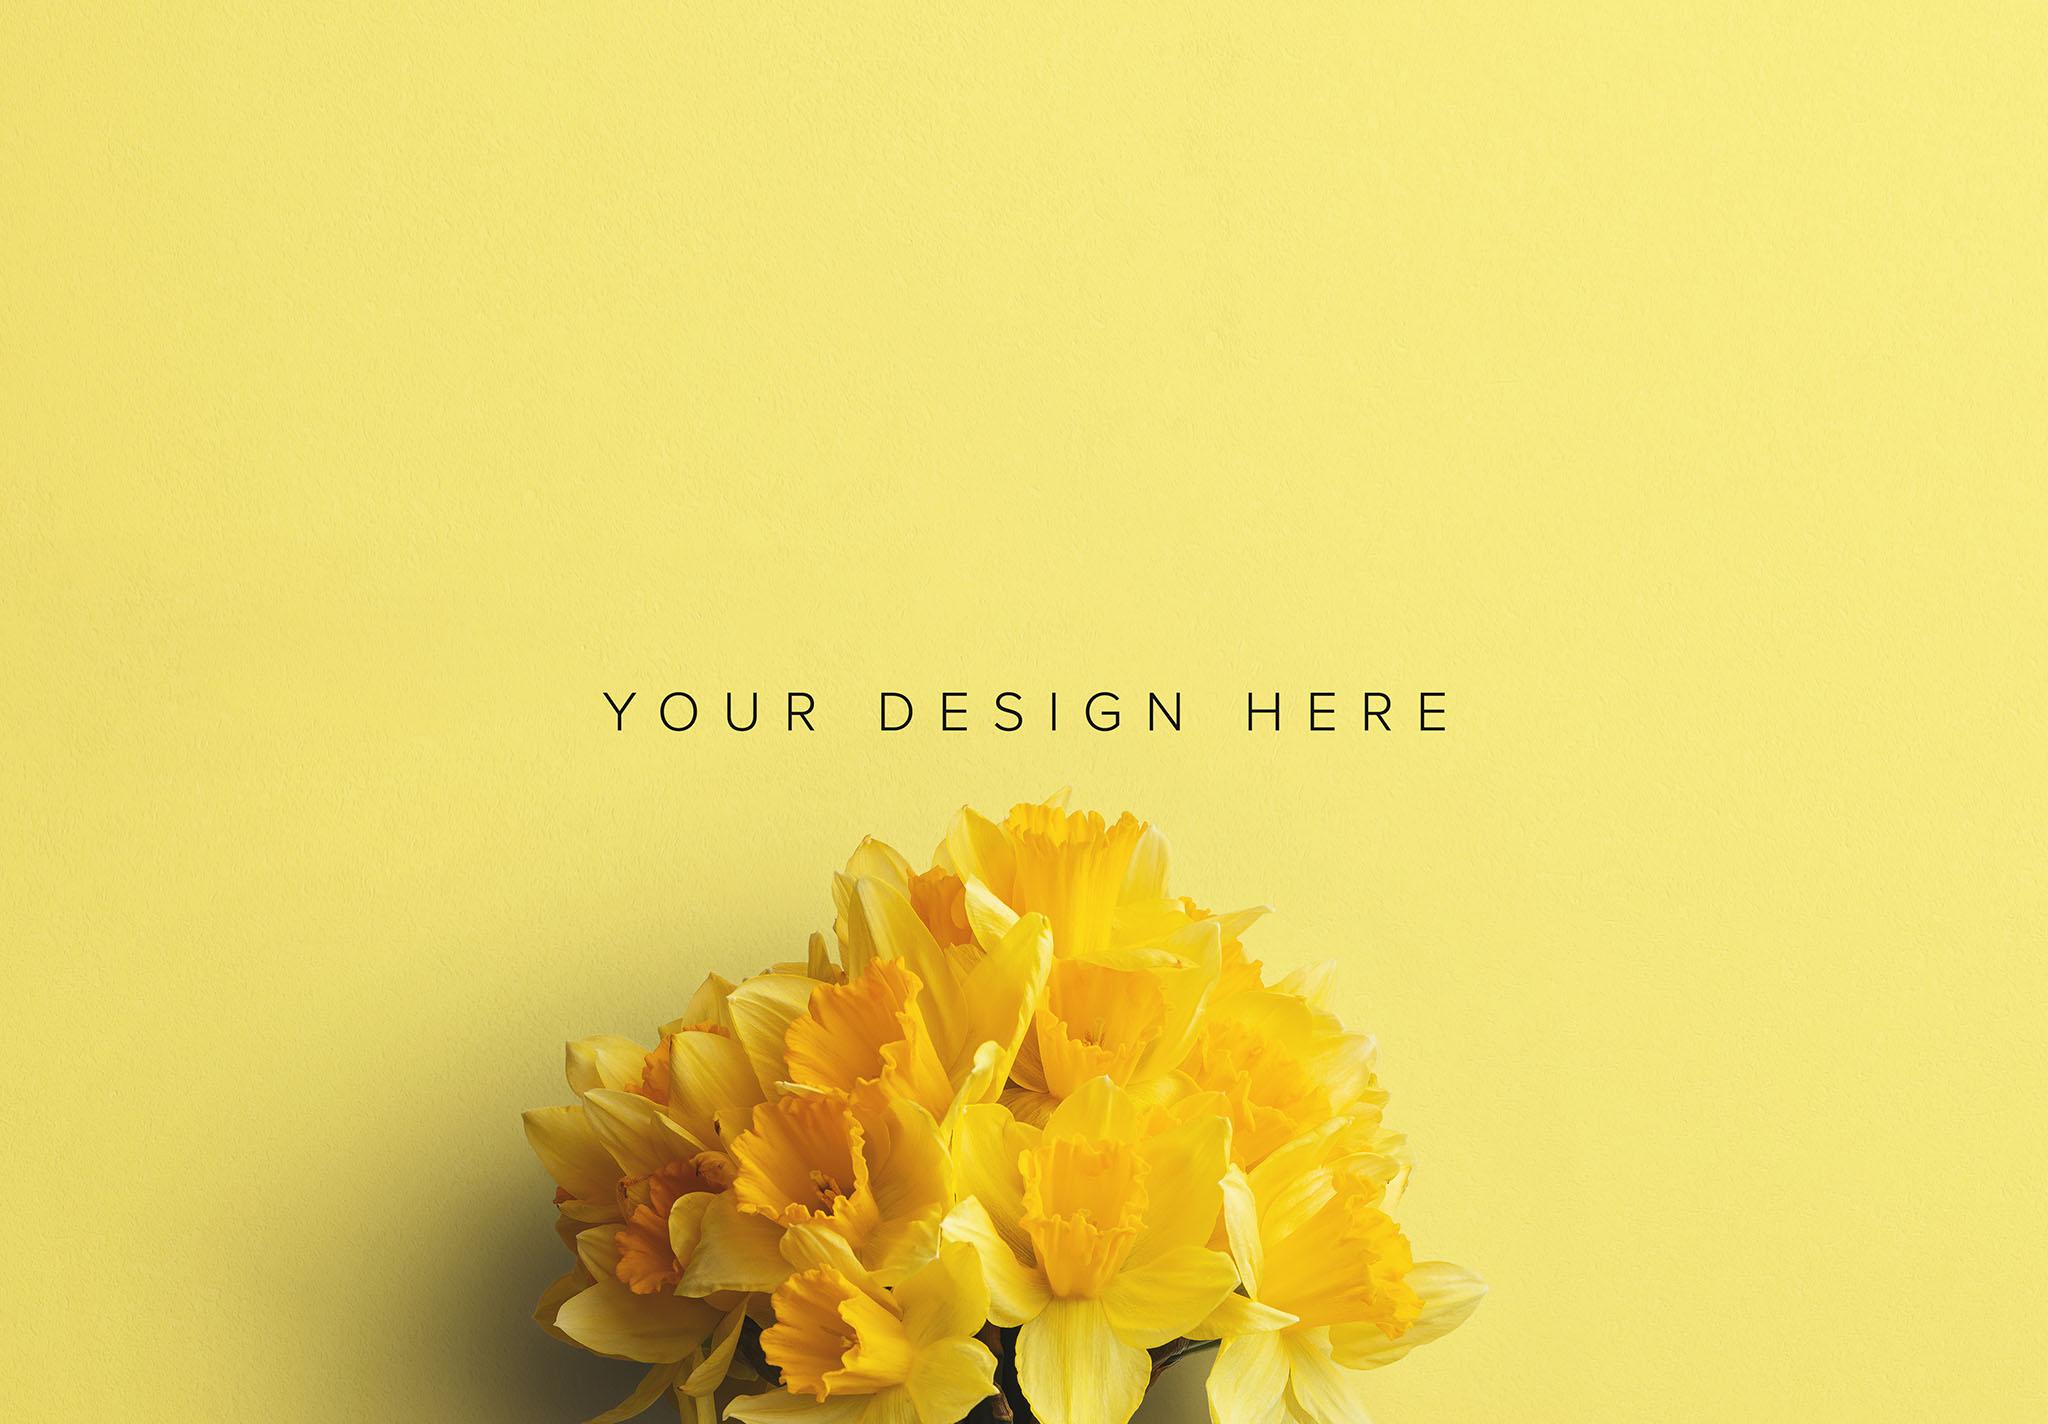 Daffodils Custom Scene Creator Template 3 Image03